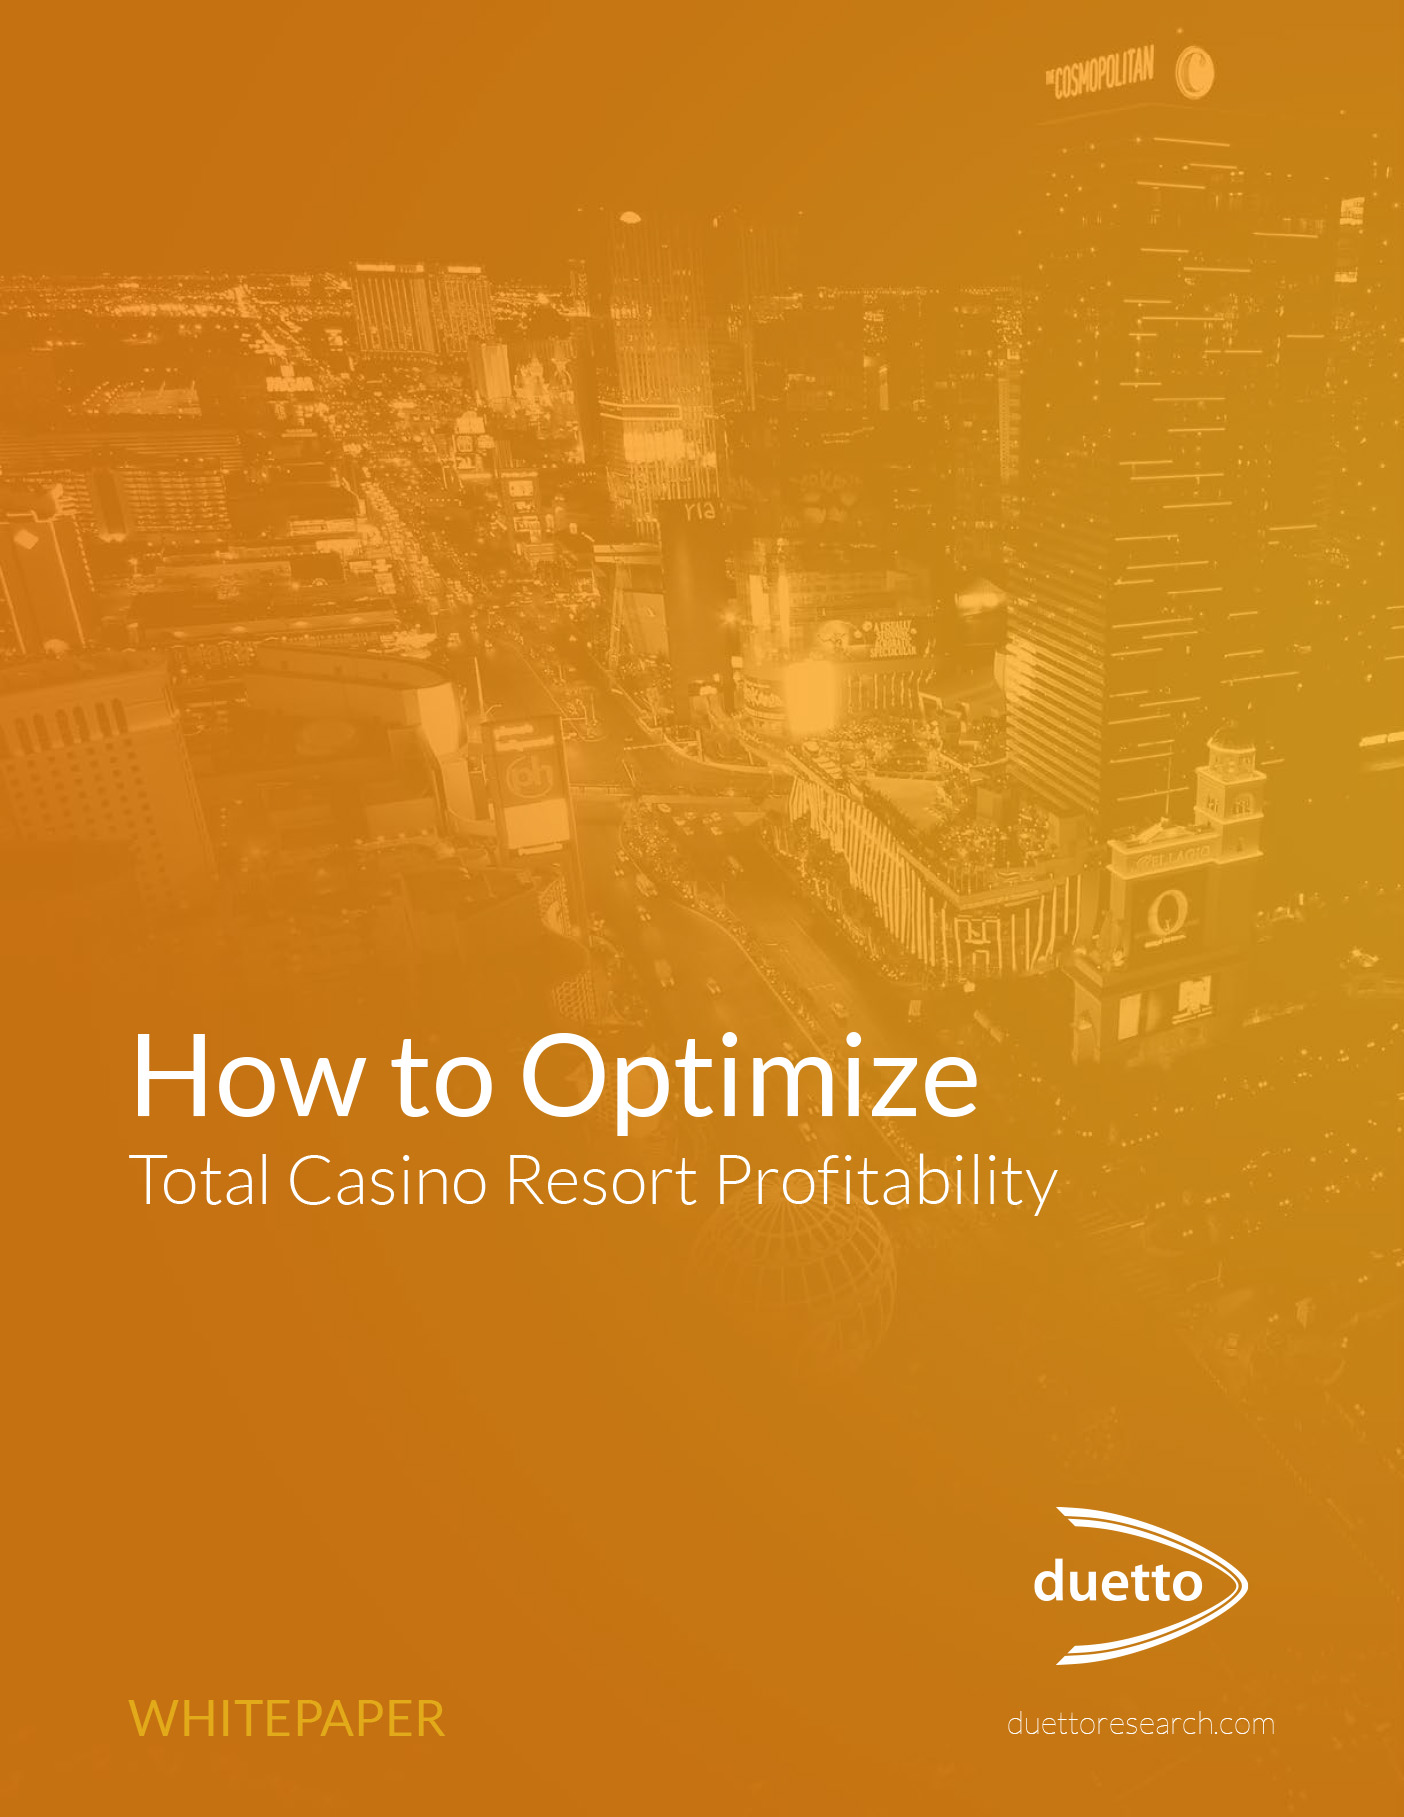 1How-to-Optimize-Casino-Profitability-1.jpg